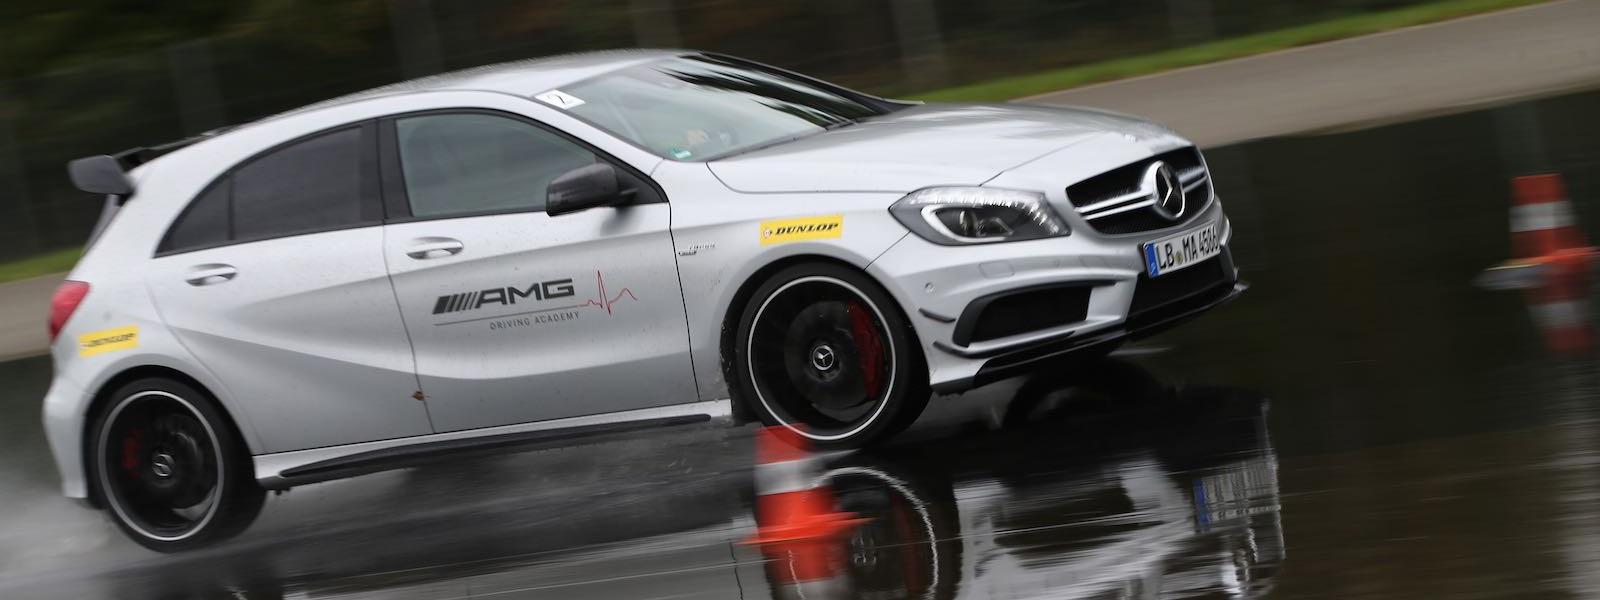 Dunlop-AMG txt 1